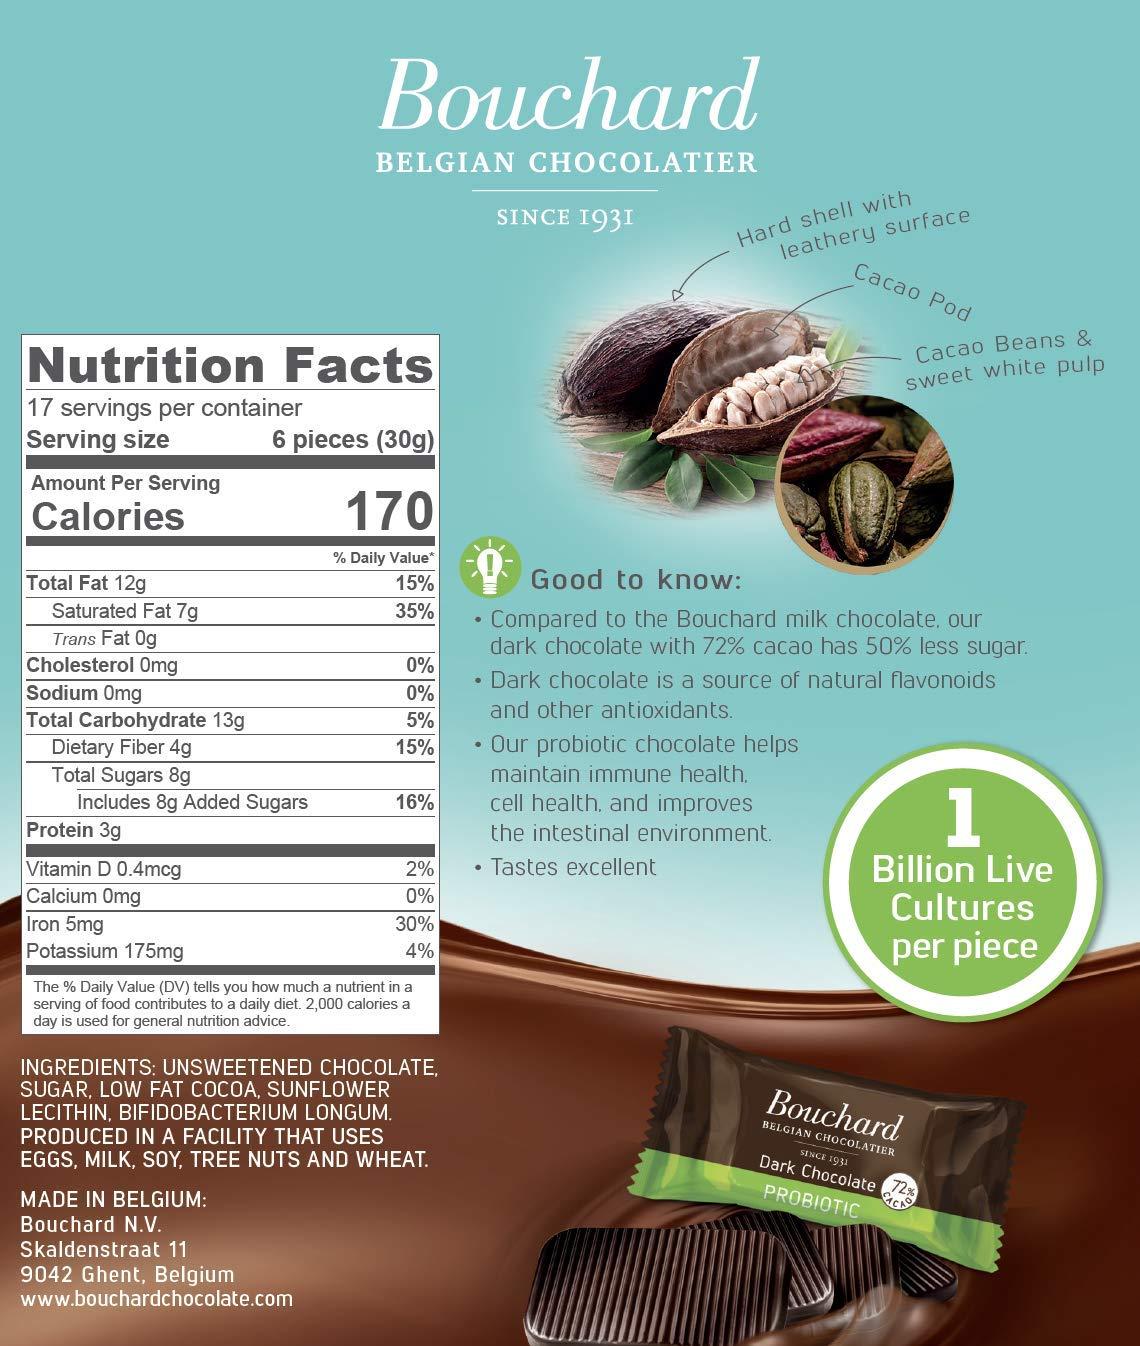 Bouchard Belgian Dark Chocolate Gluten-Free 72 % Cacao with Probiotics (100 Pieces) by Bouchard (Image #4)